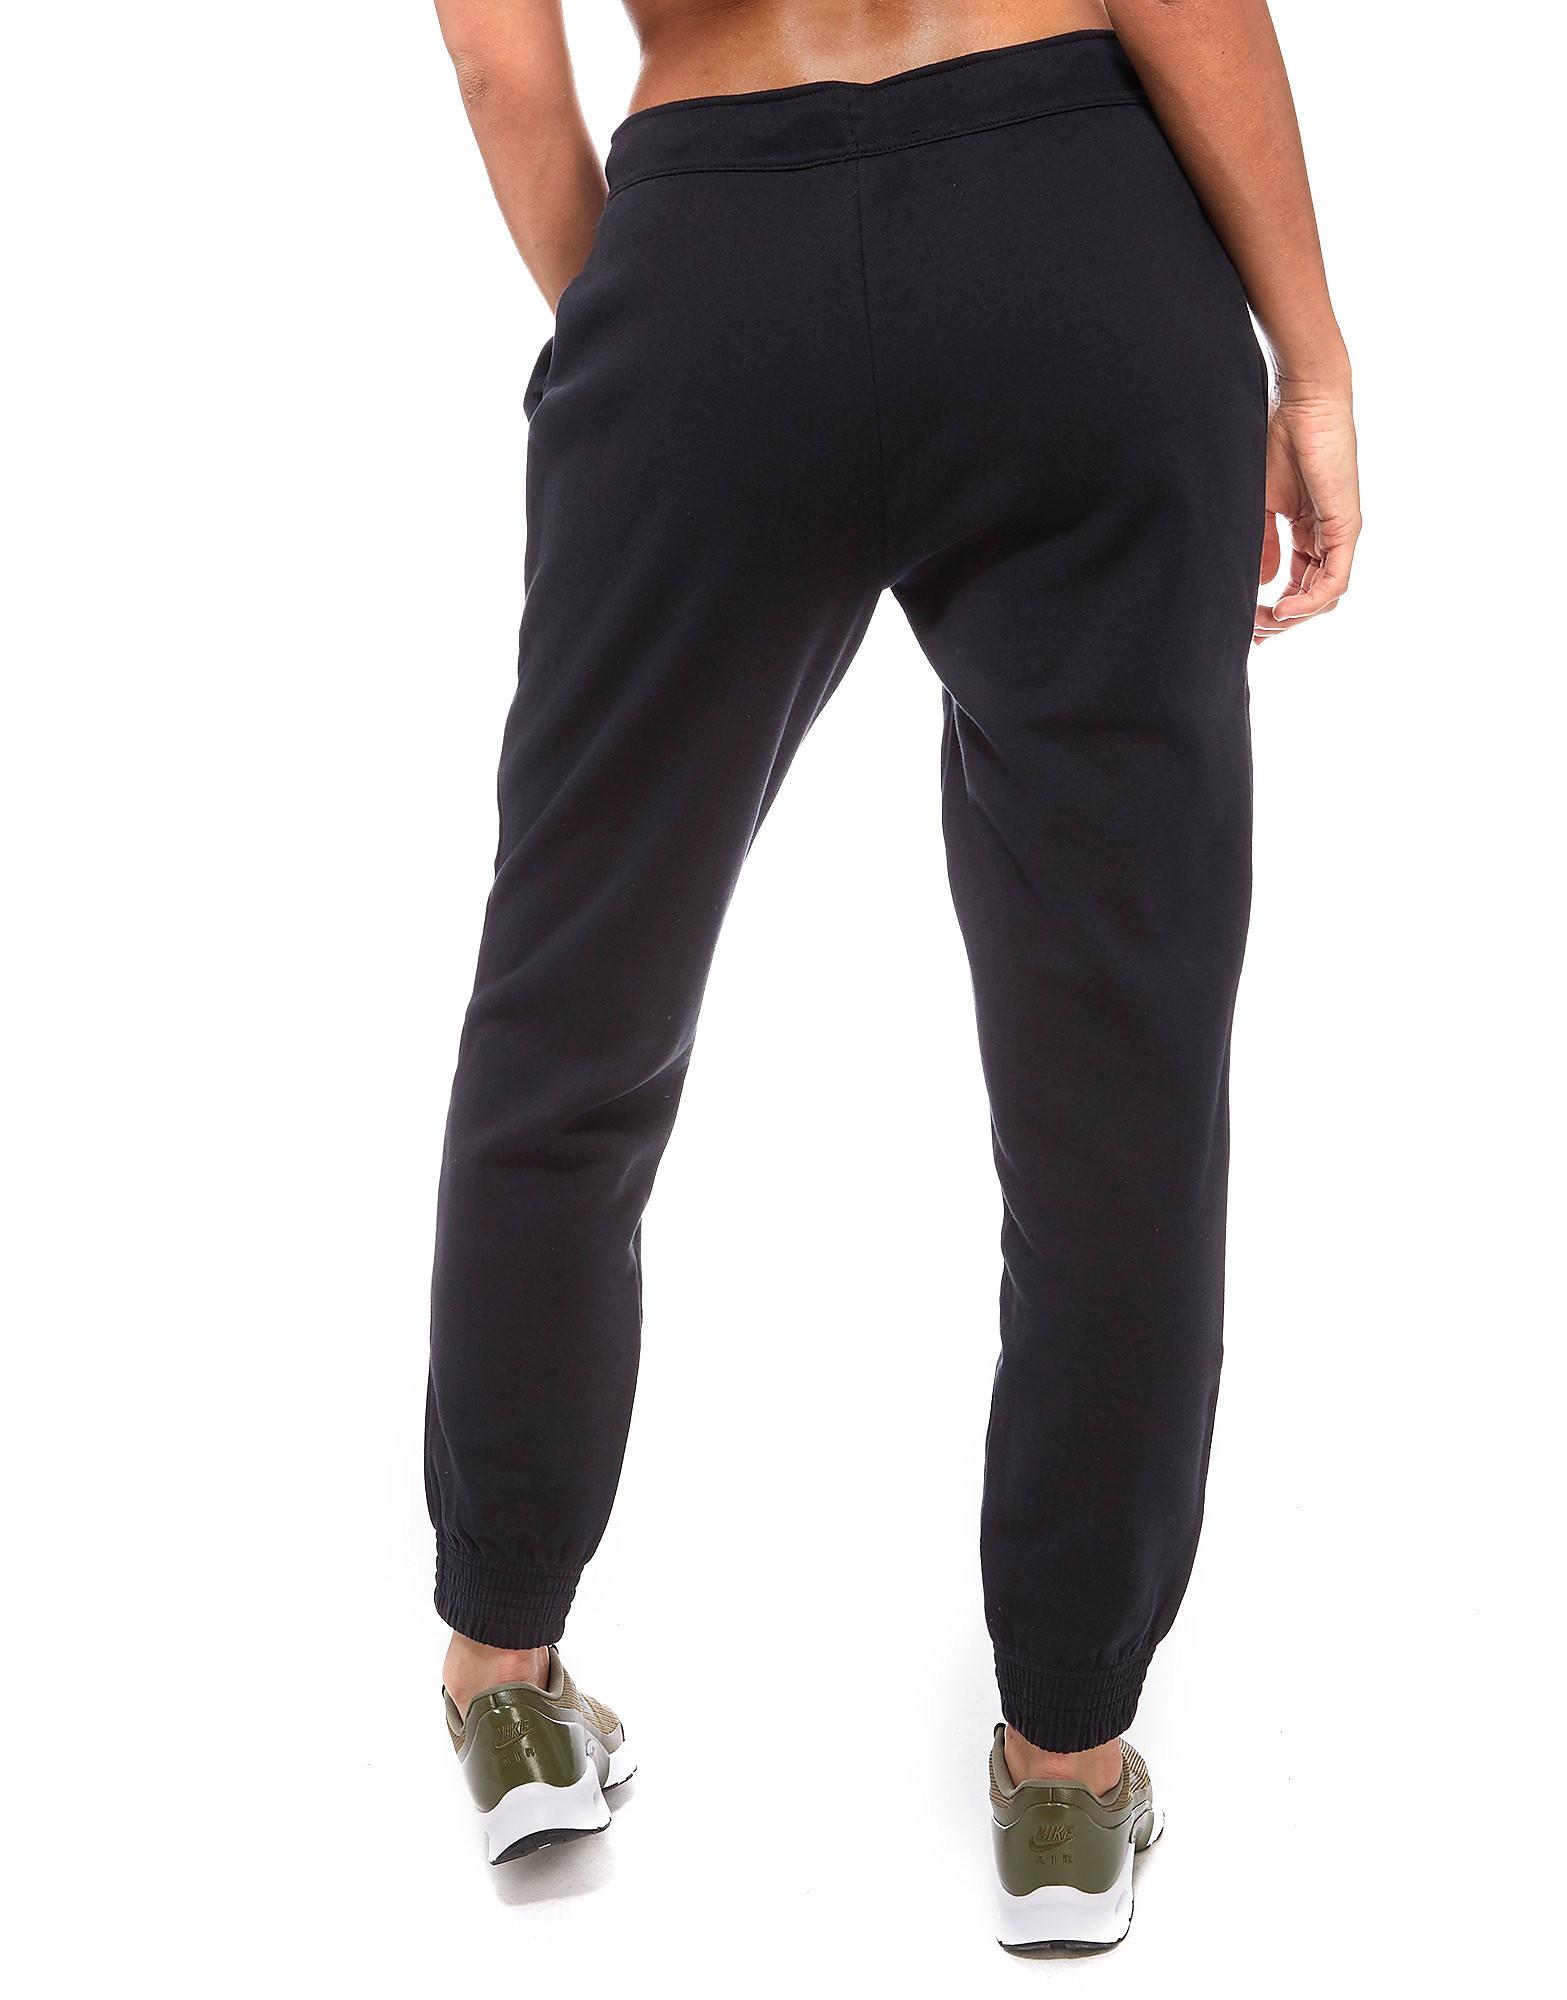 Nike Advance 15 Track Pants